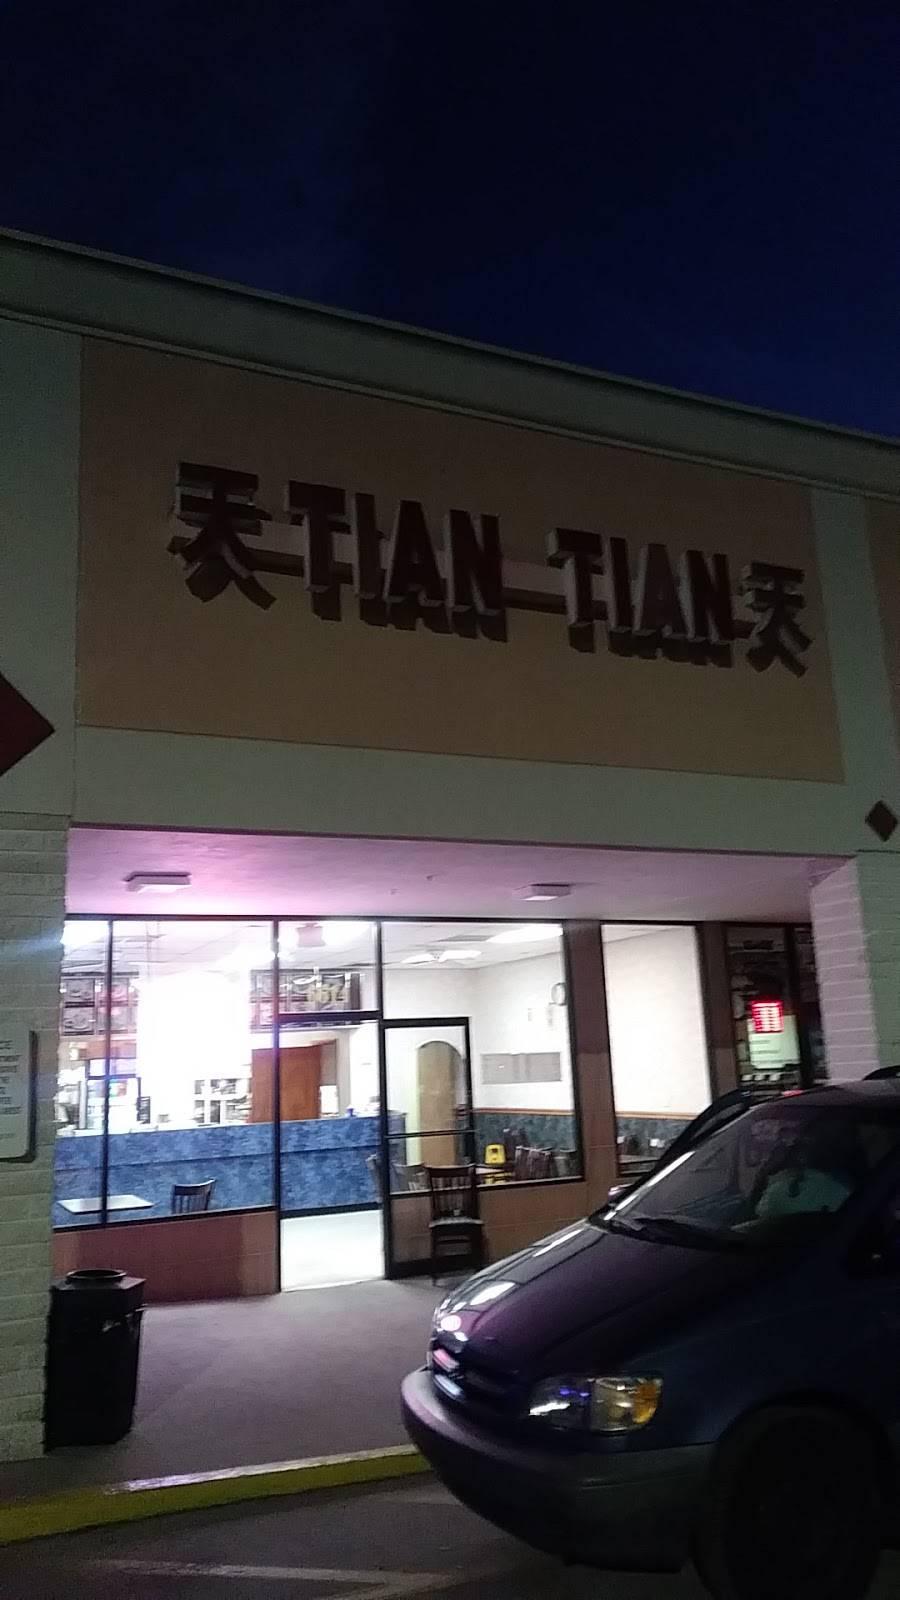 Tian Tian Chinese Restaurant | restaurant | 6614 Ridge Rd, Port Richey, FL 34668, USA | 7278459096 OR +1 727-845-9096